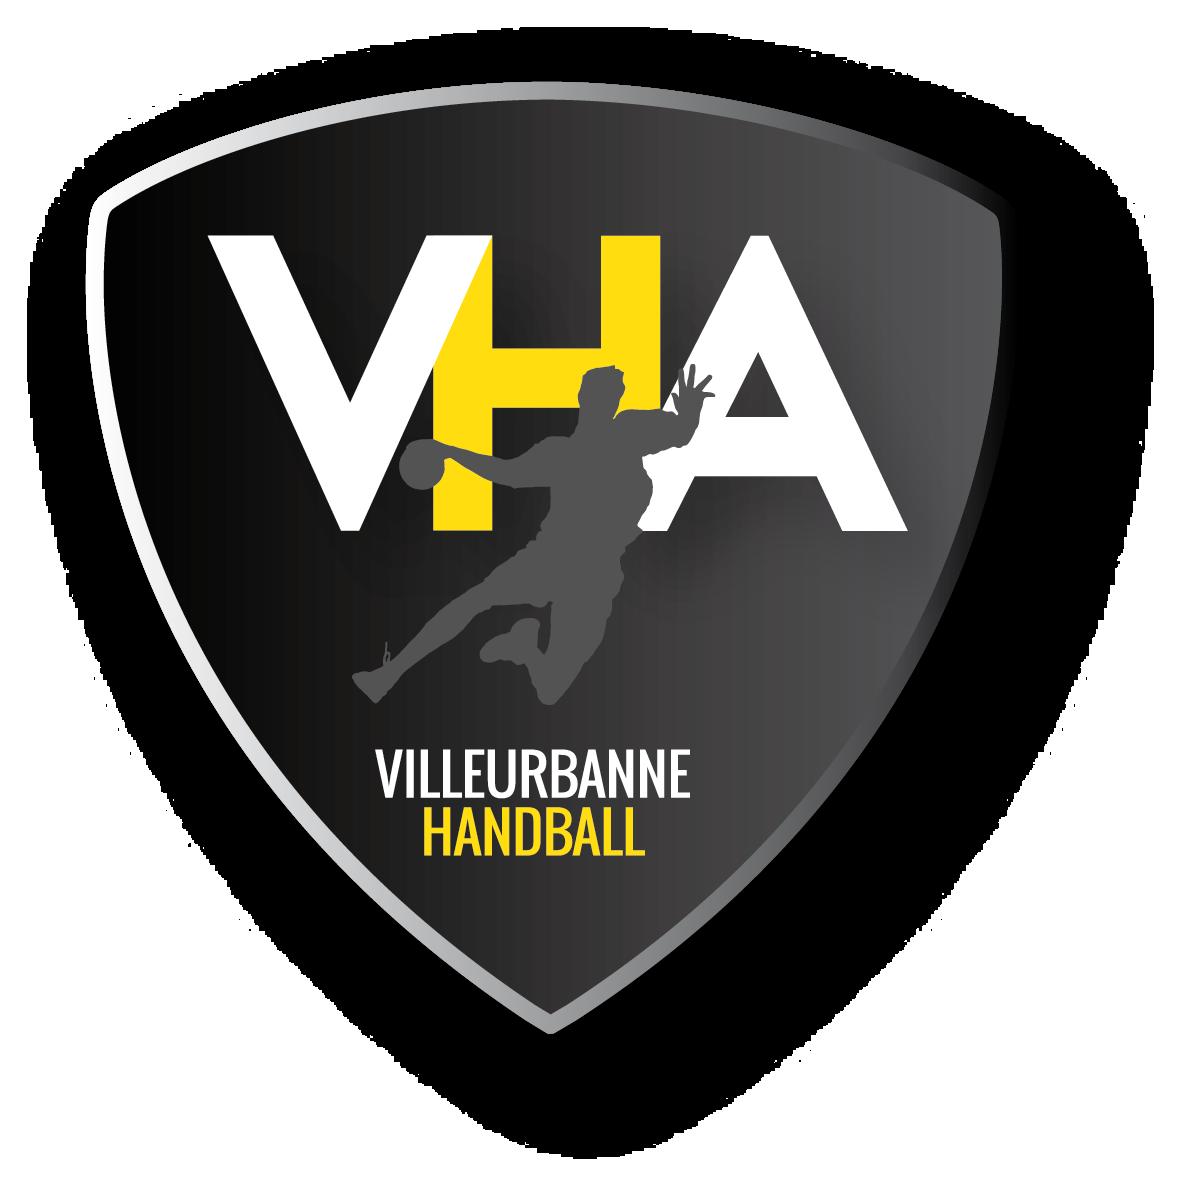 (c) Villeurbanneha.fr